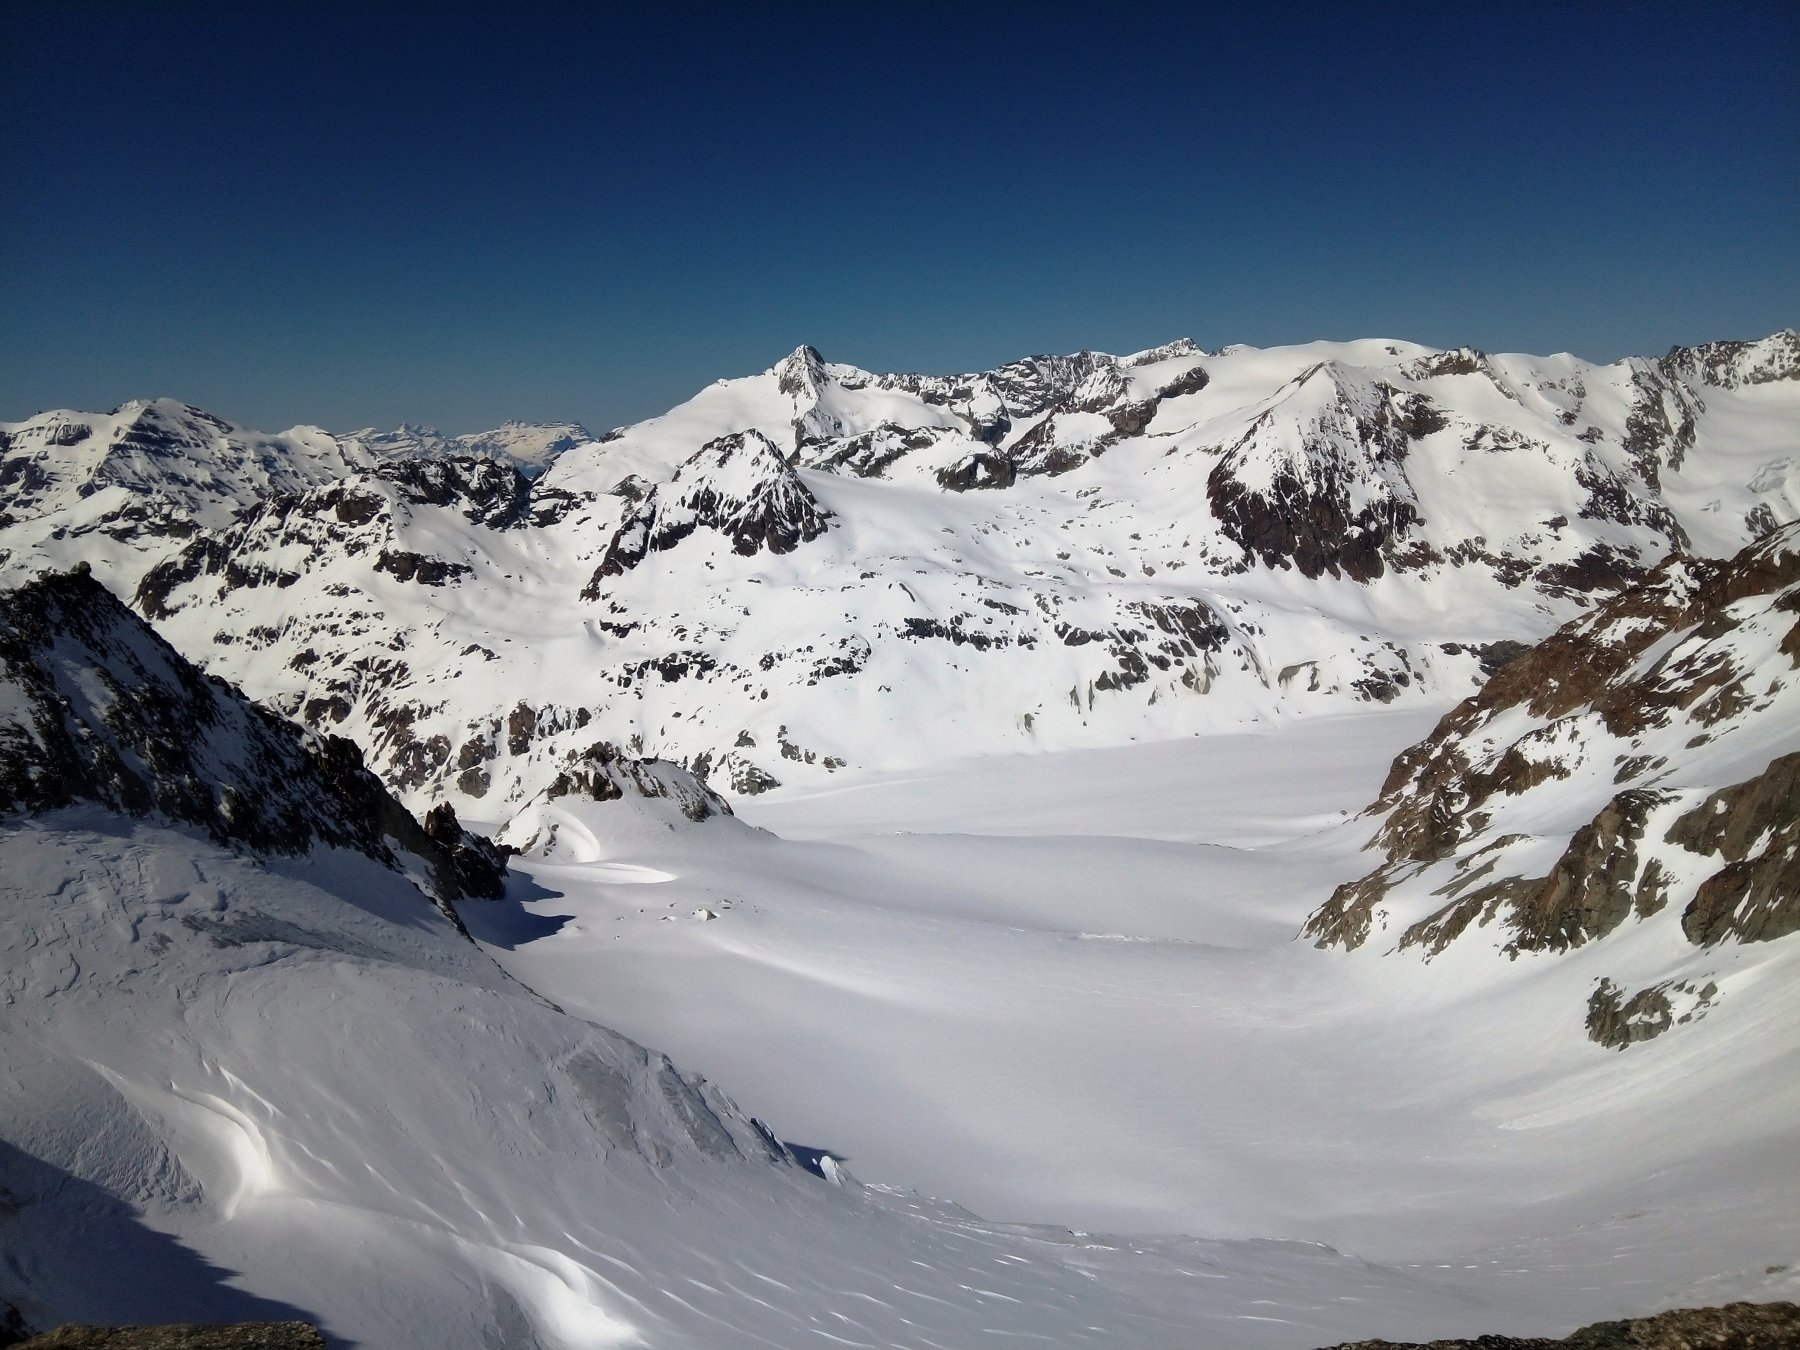 ghiacciaio di Otemma